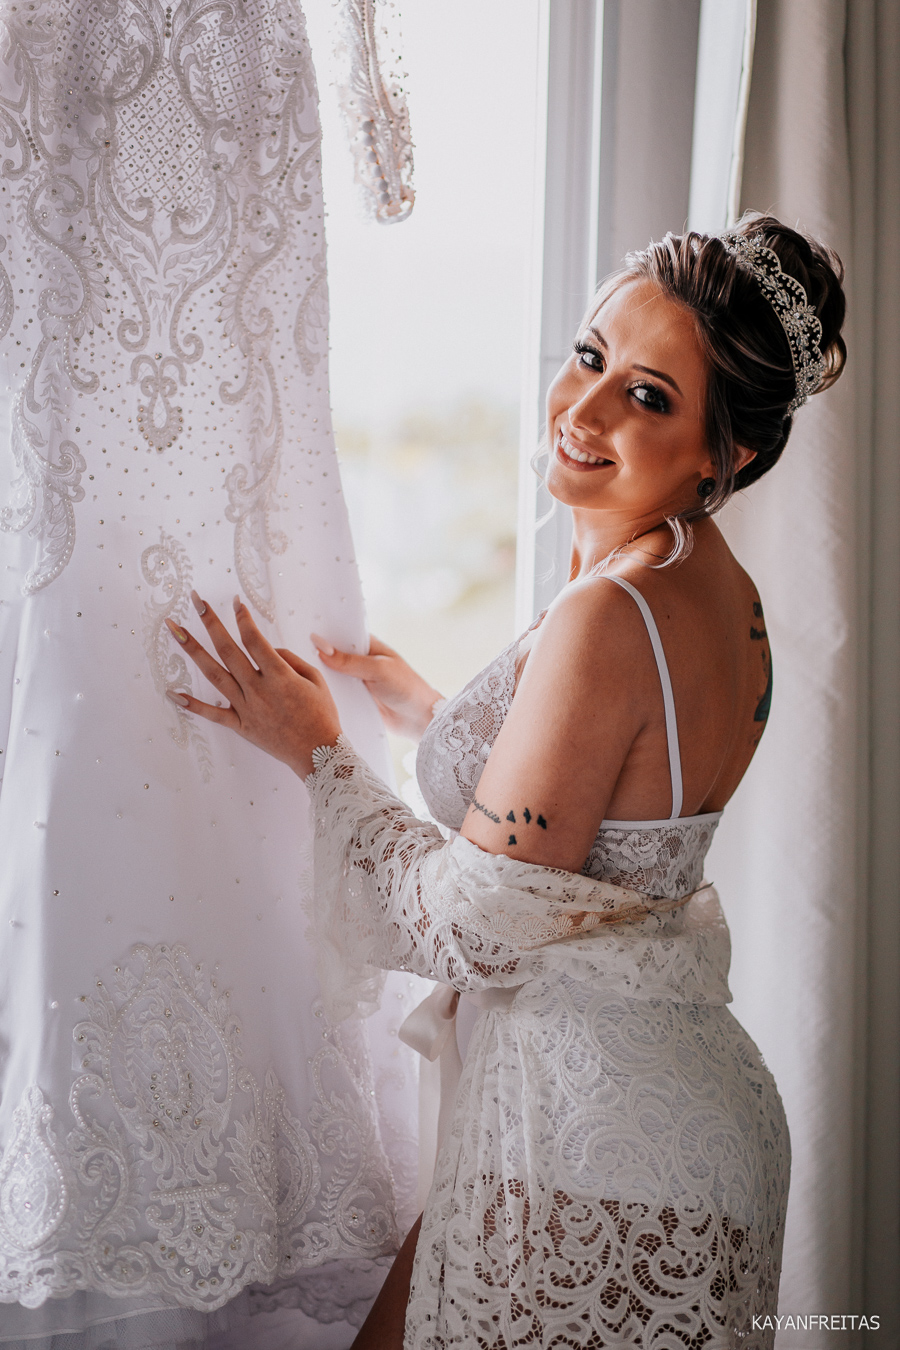 casamento-mariadomar-floripa-0030 Casamento Jéssica e Felipe - Maria do Mar Hotel